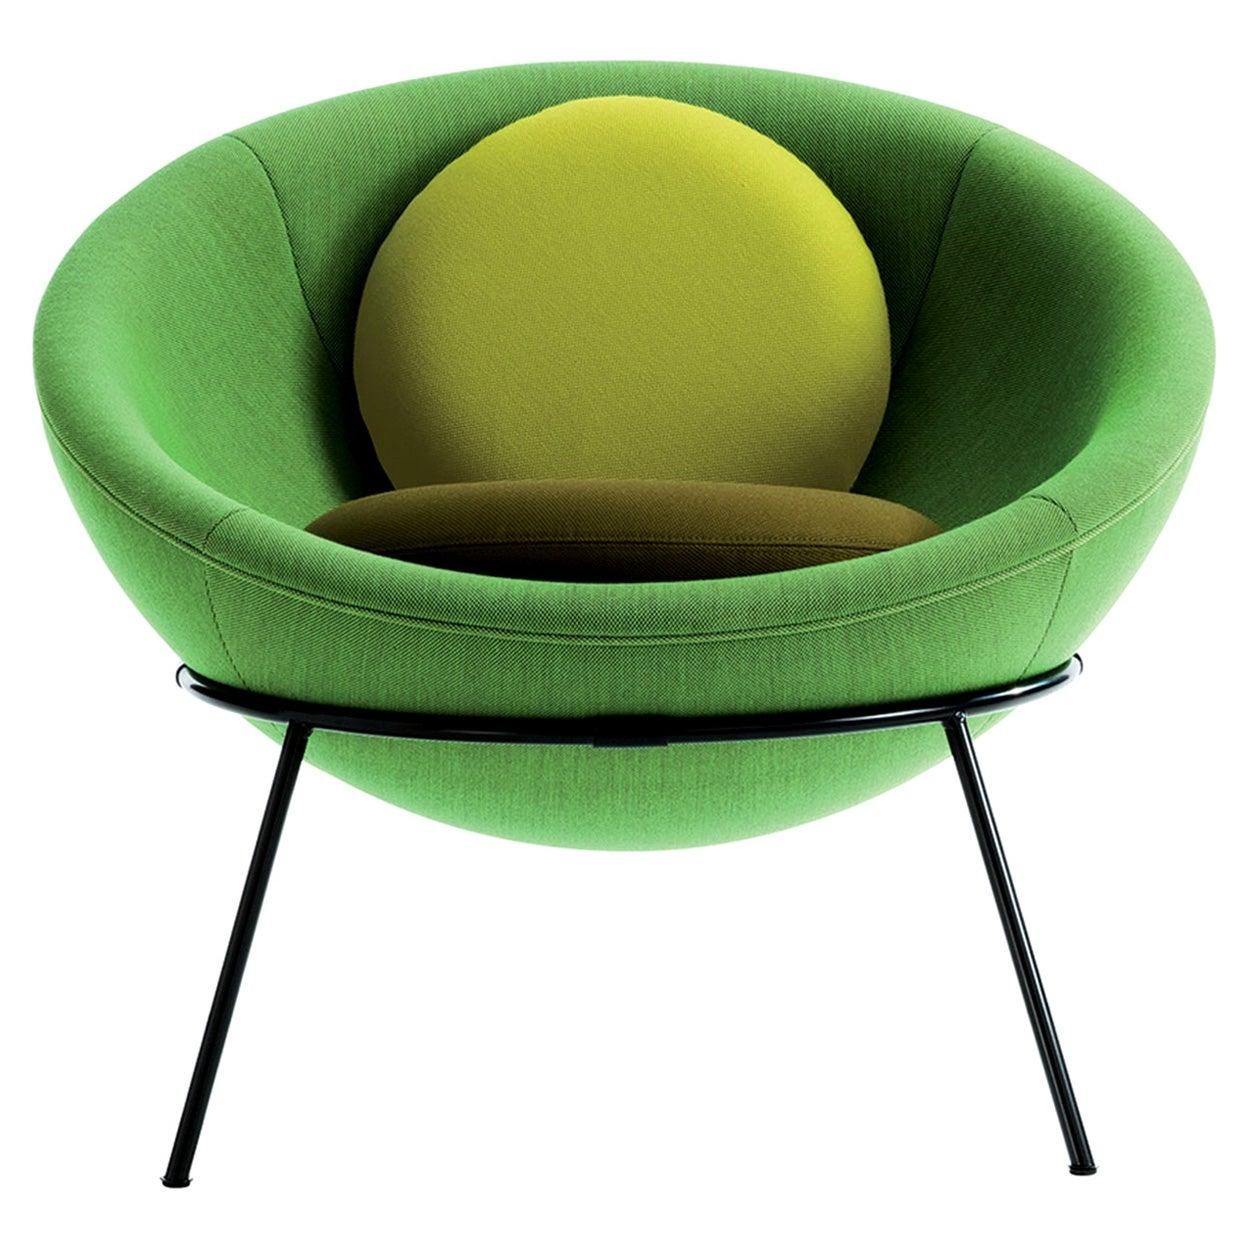 Bardi's Bowl Chair Green Nuance